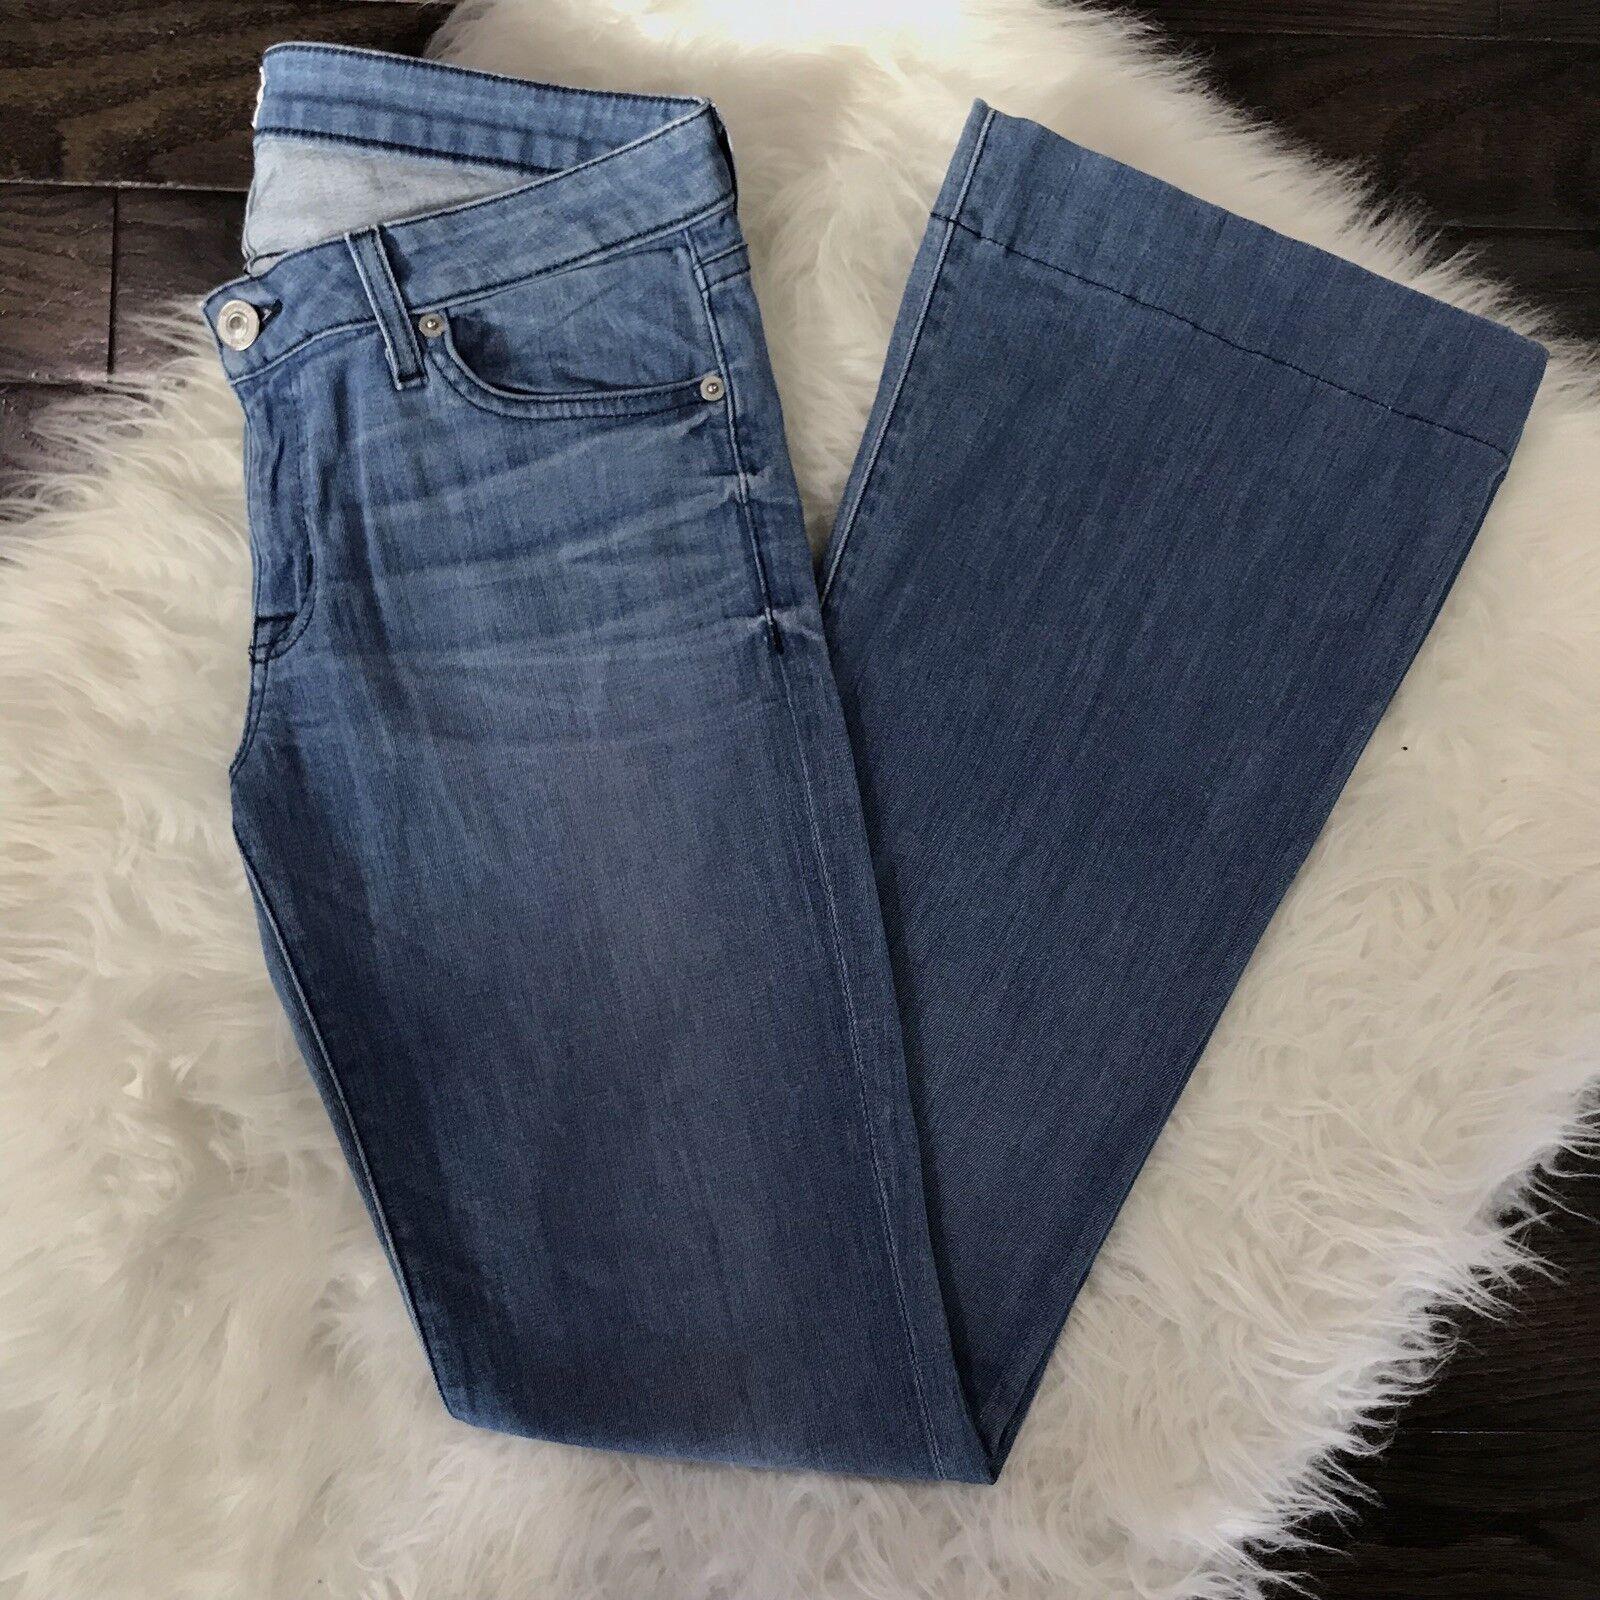 Hudson Women's Size 28 Jeans Ferris Flare Aruba Wash